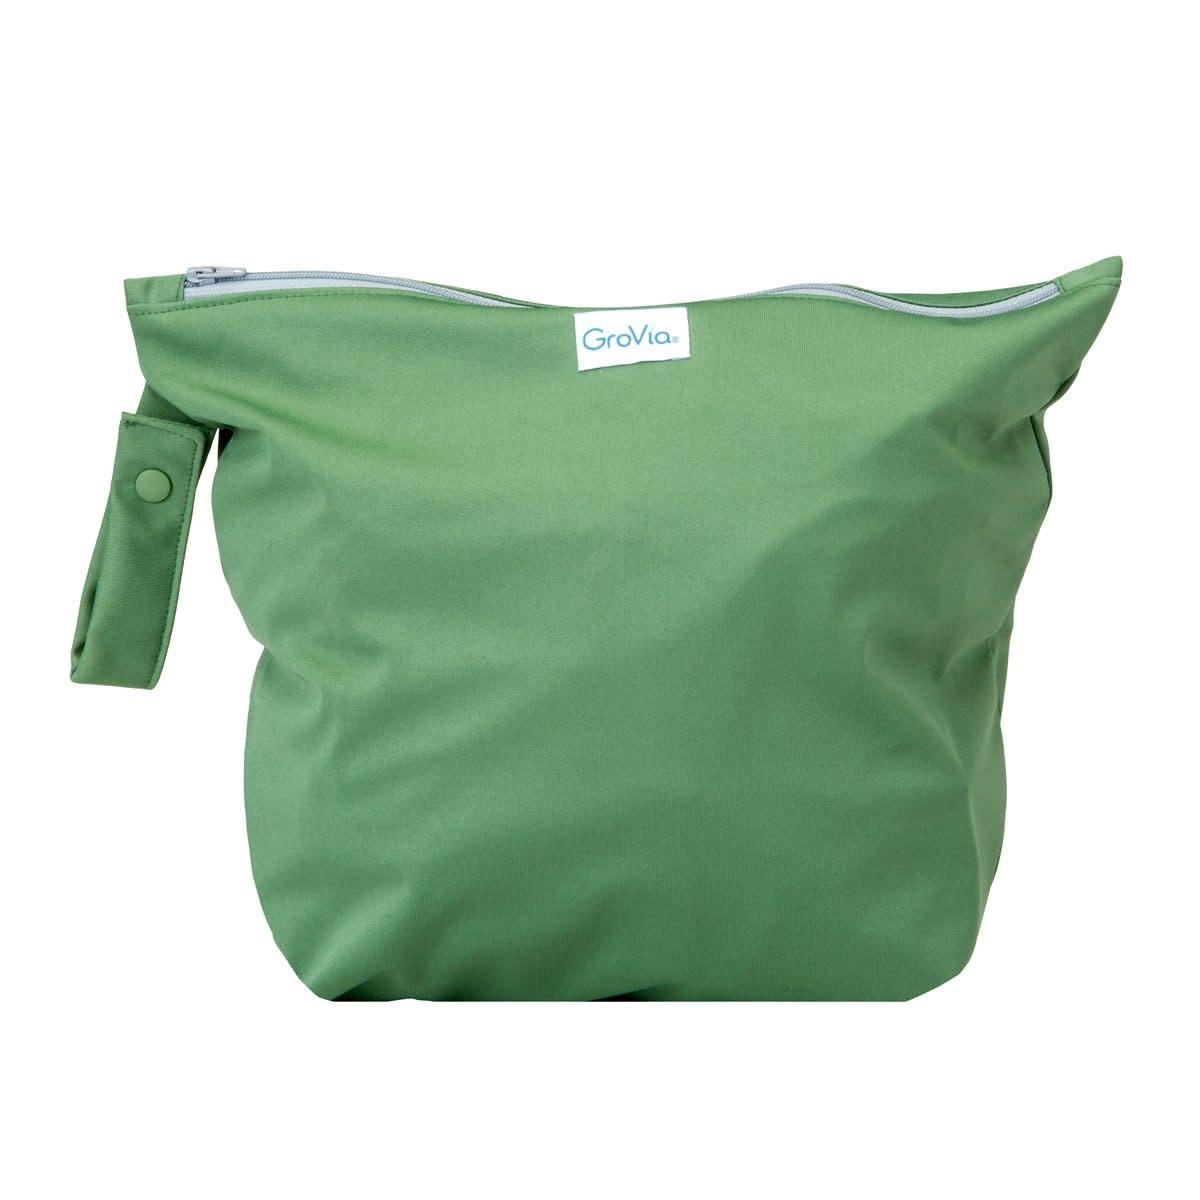 GroVia Zippered Wet Bag Basil